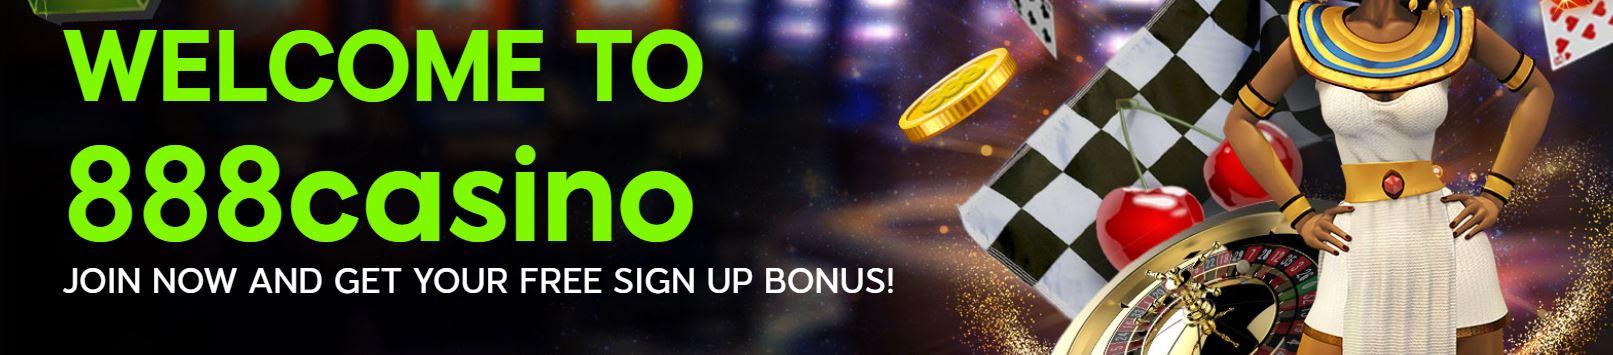 888casino Welcome Bonus